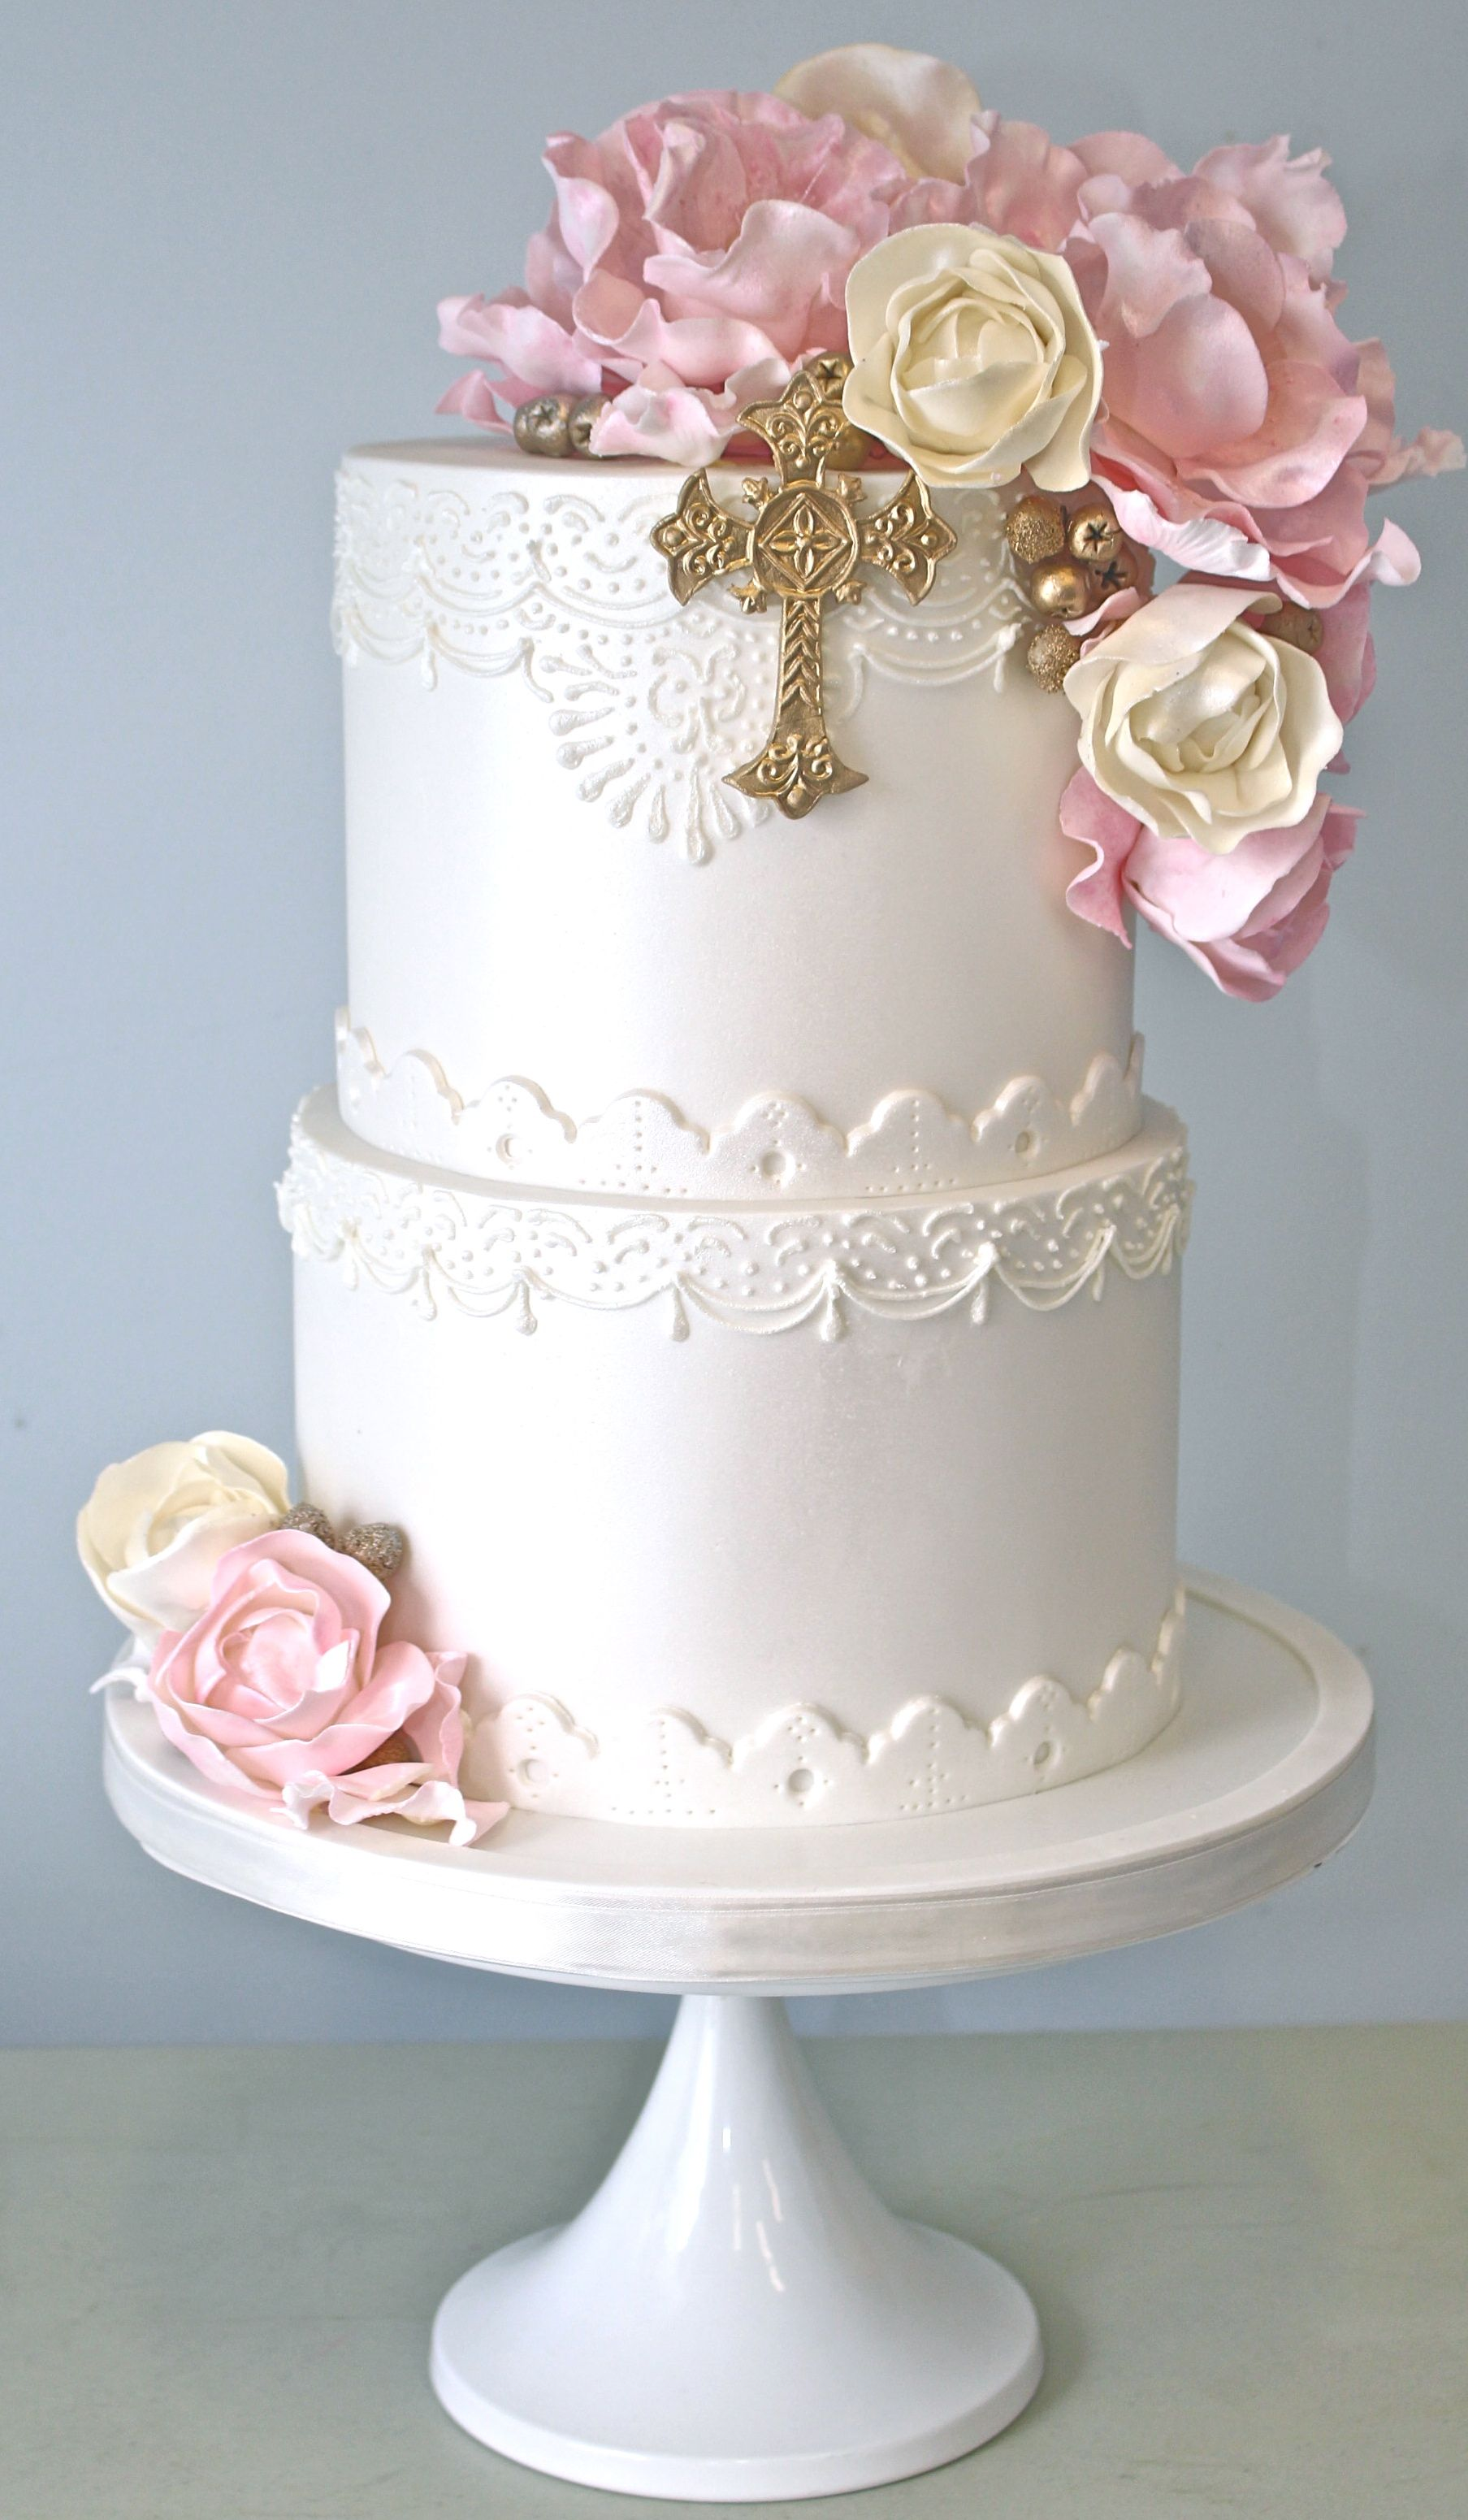 Pretty Parties - Custom Cakes CH-02 Christening / Communion